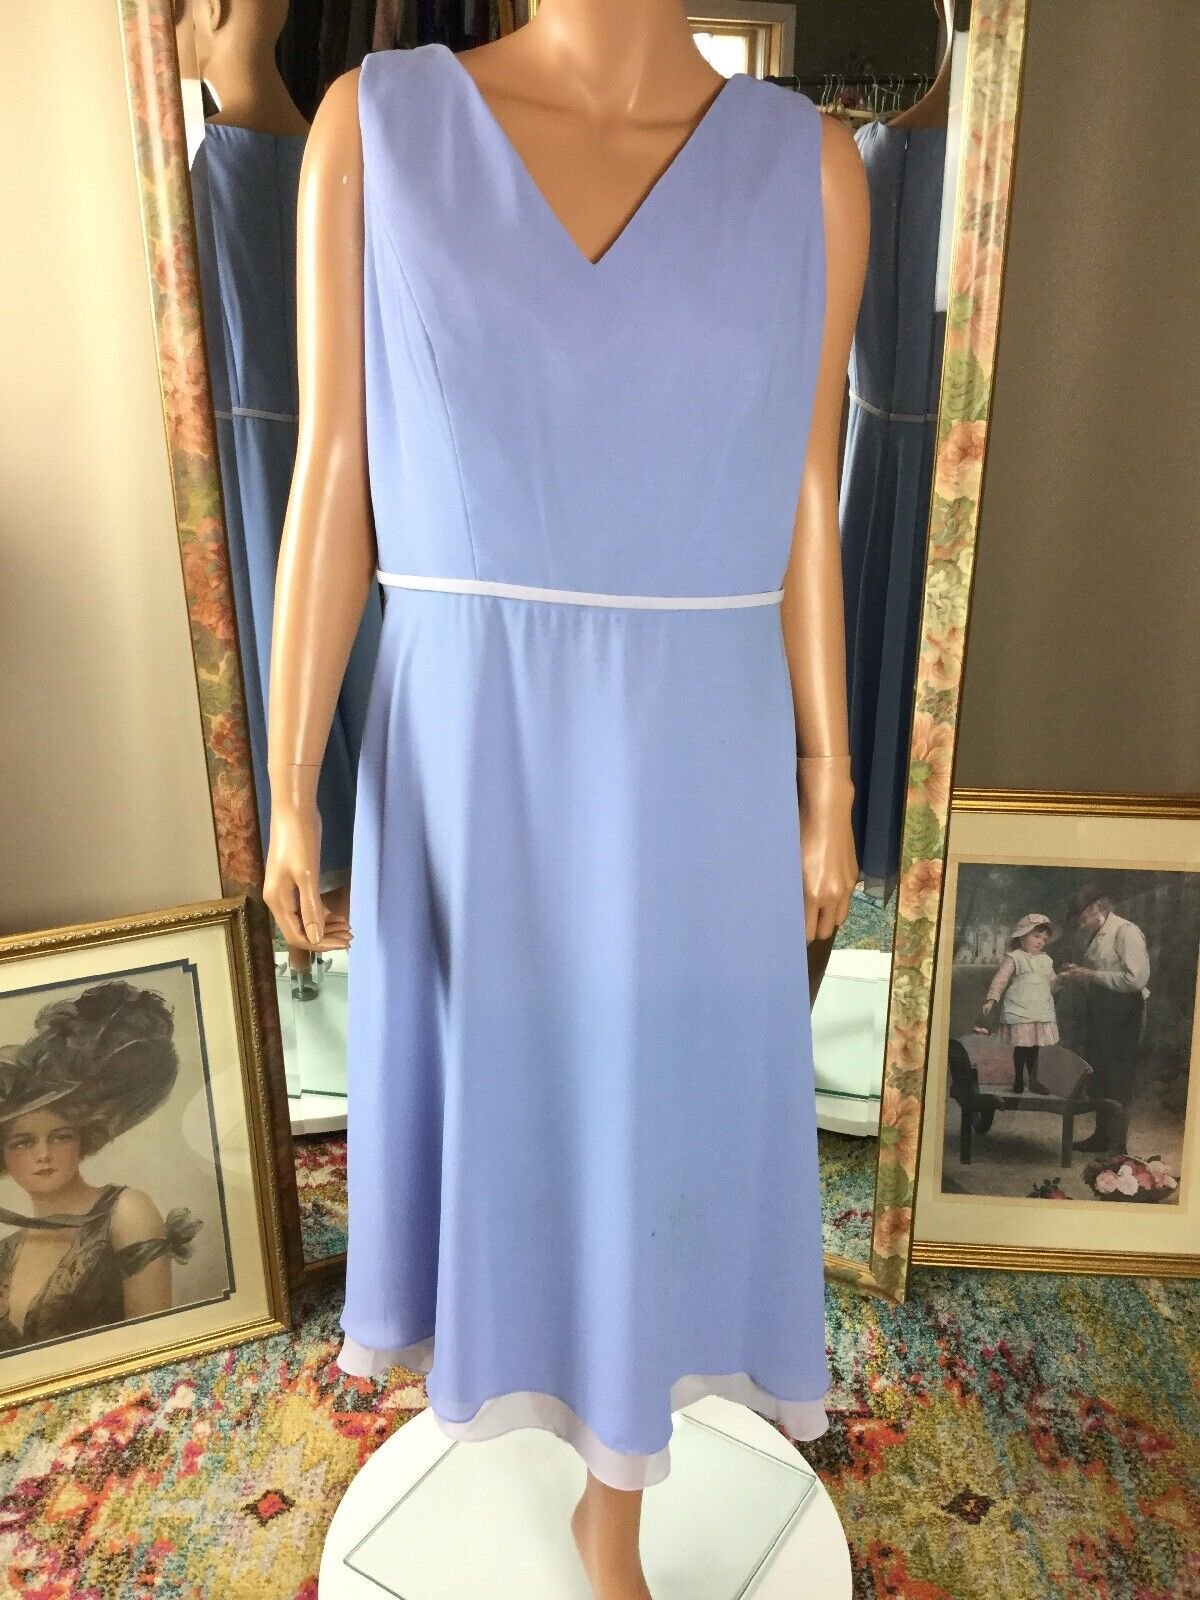 BELSOIE SZ 16 Periwinkle Blue Lilac Dress Sleeveless Triple Skirt Tea Length